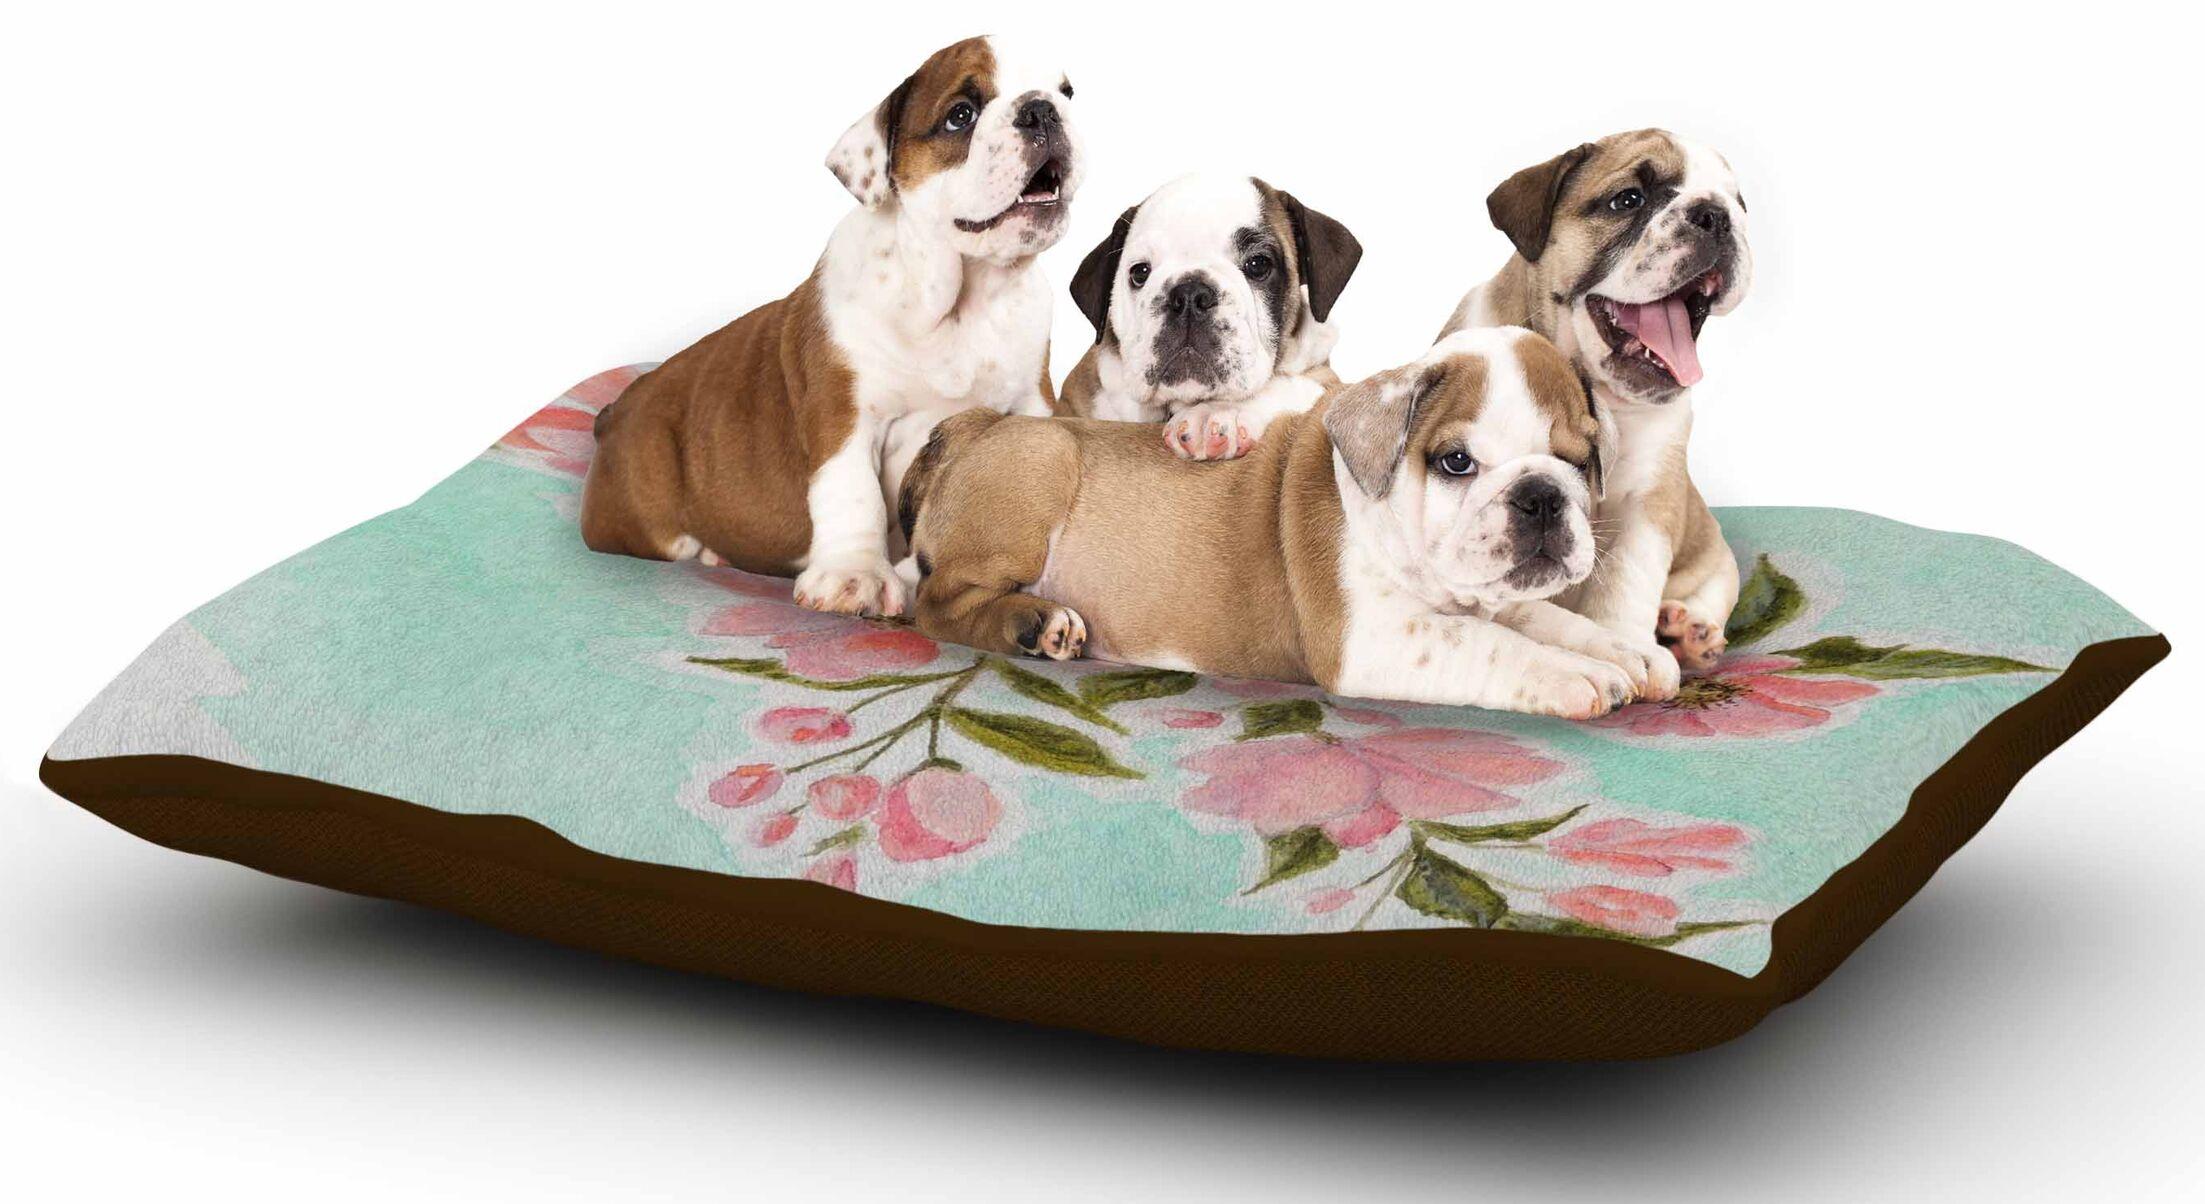 Christen Treat 'Chieko' Mint Dog Pillow with Fleece Cozy Top